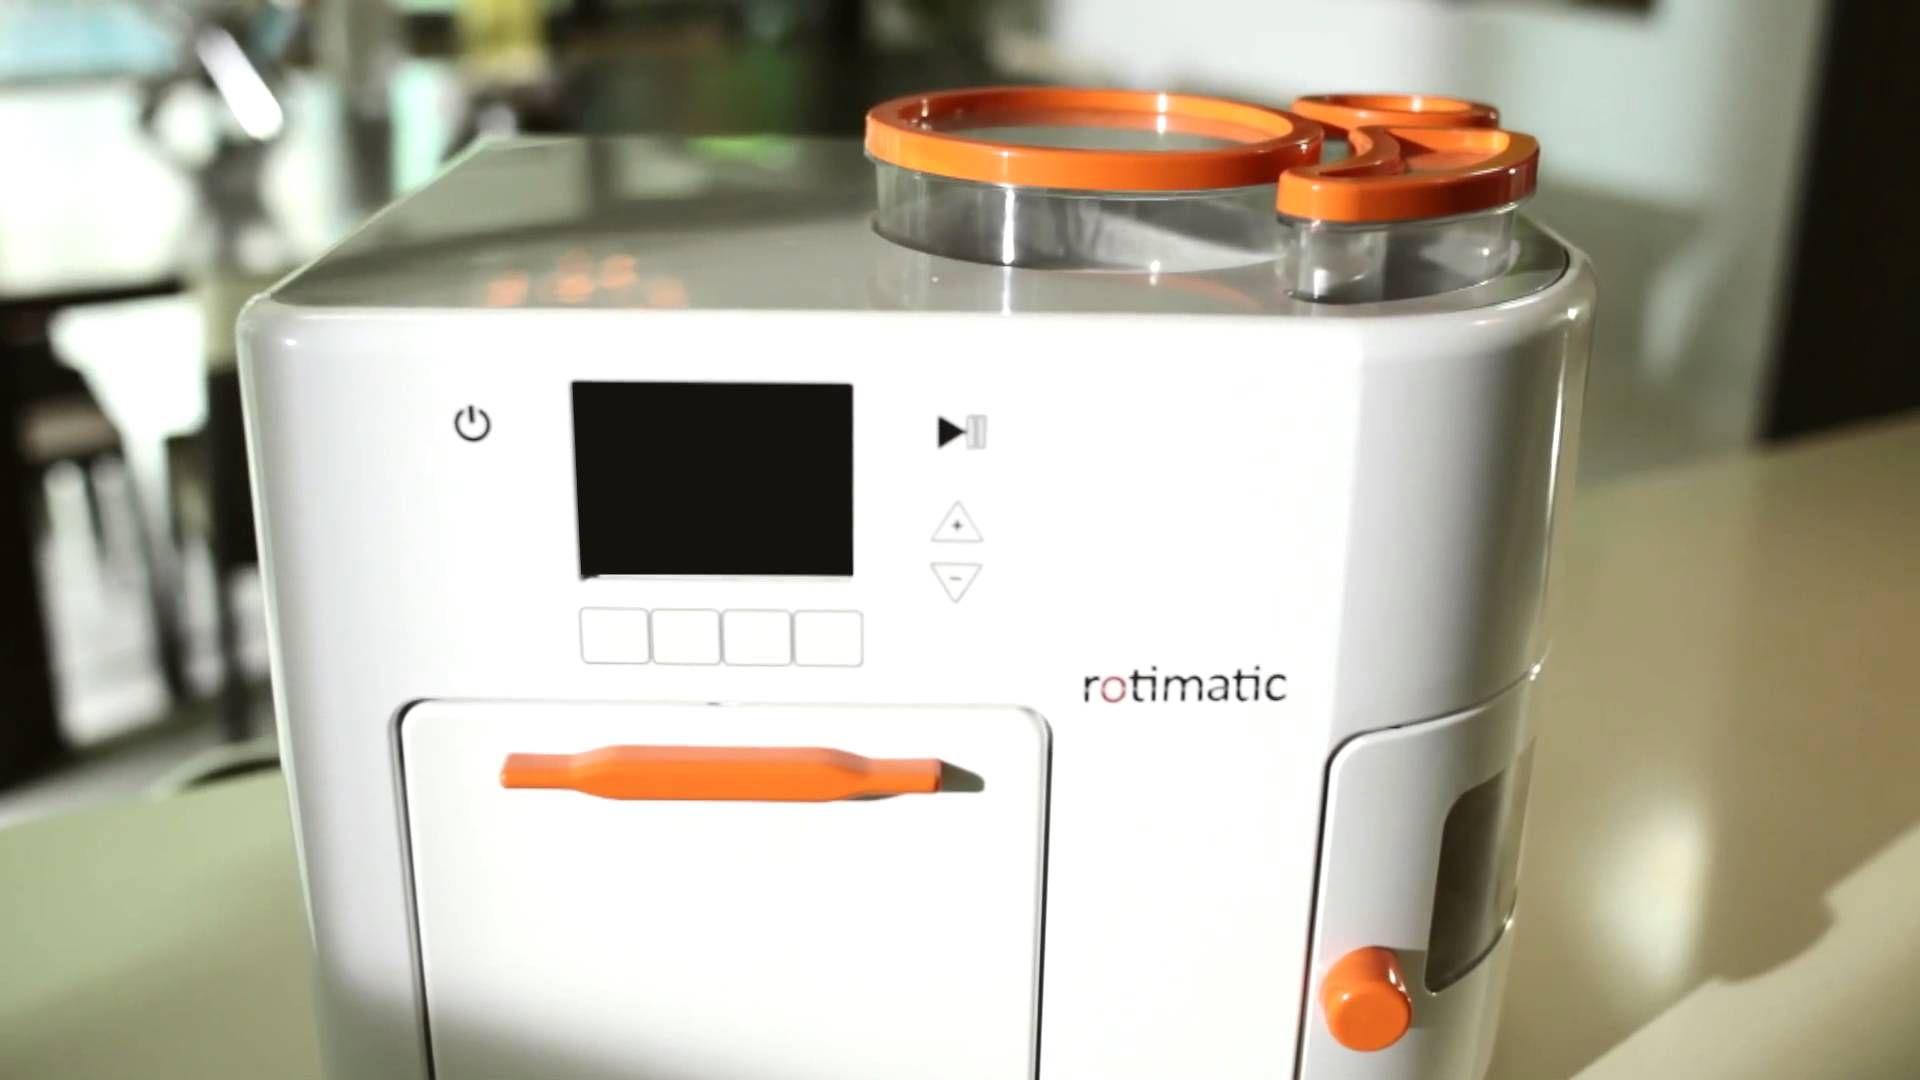 Mm, this looks amazing! Rotimatic - Automatic roti making appliance ...